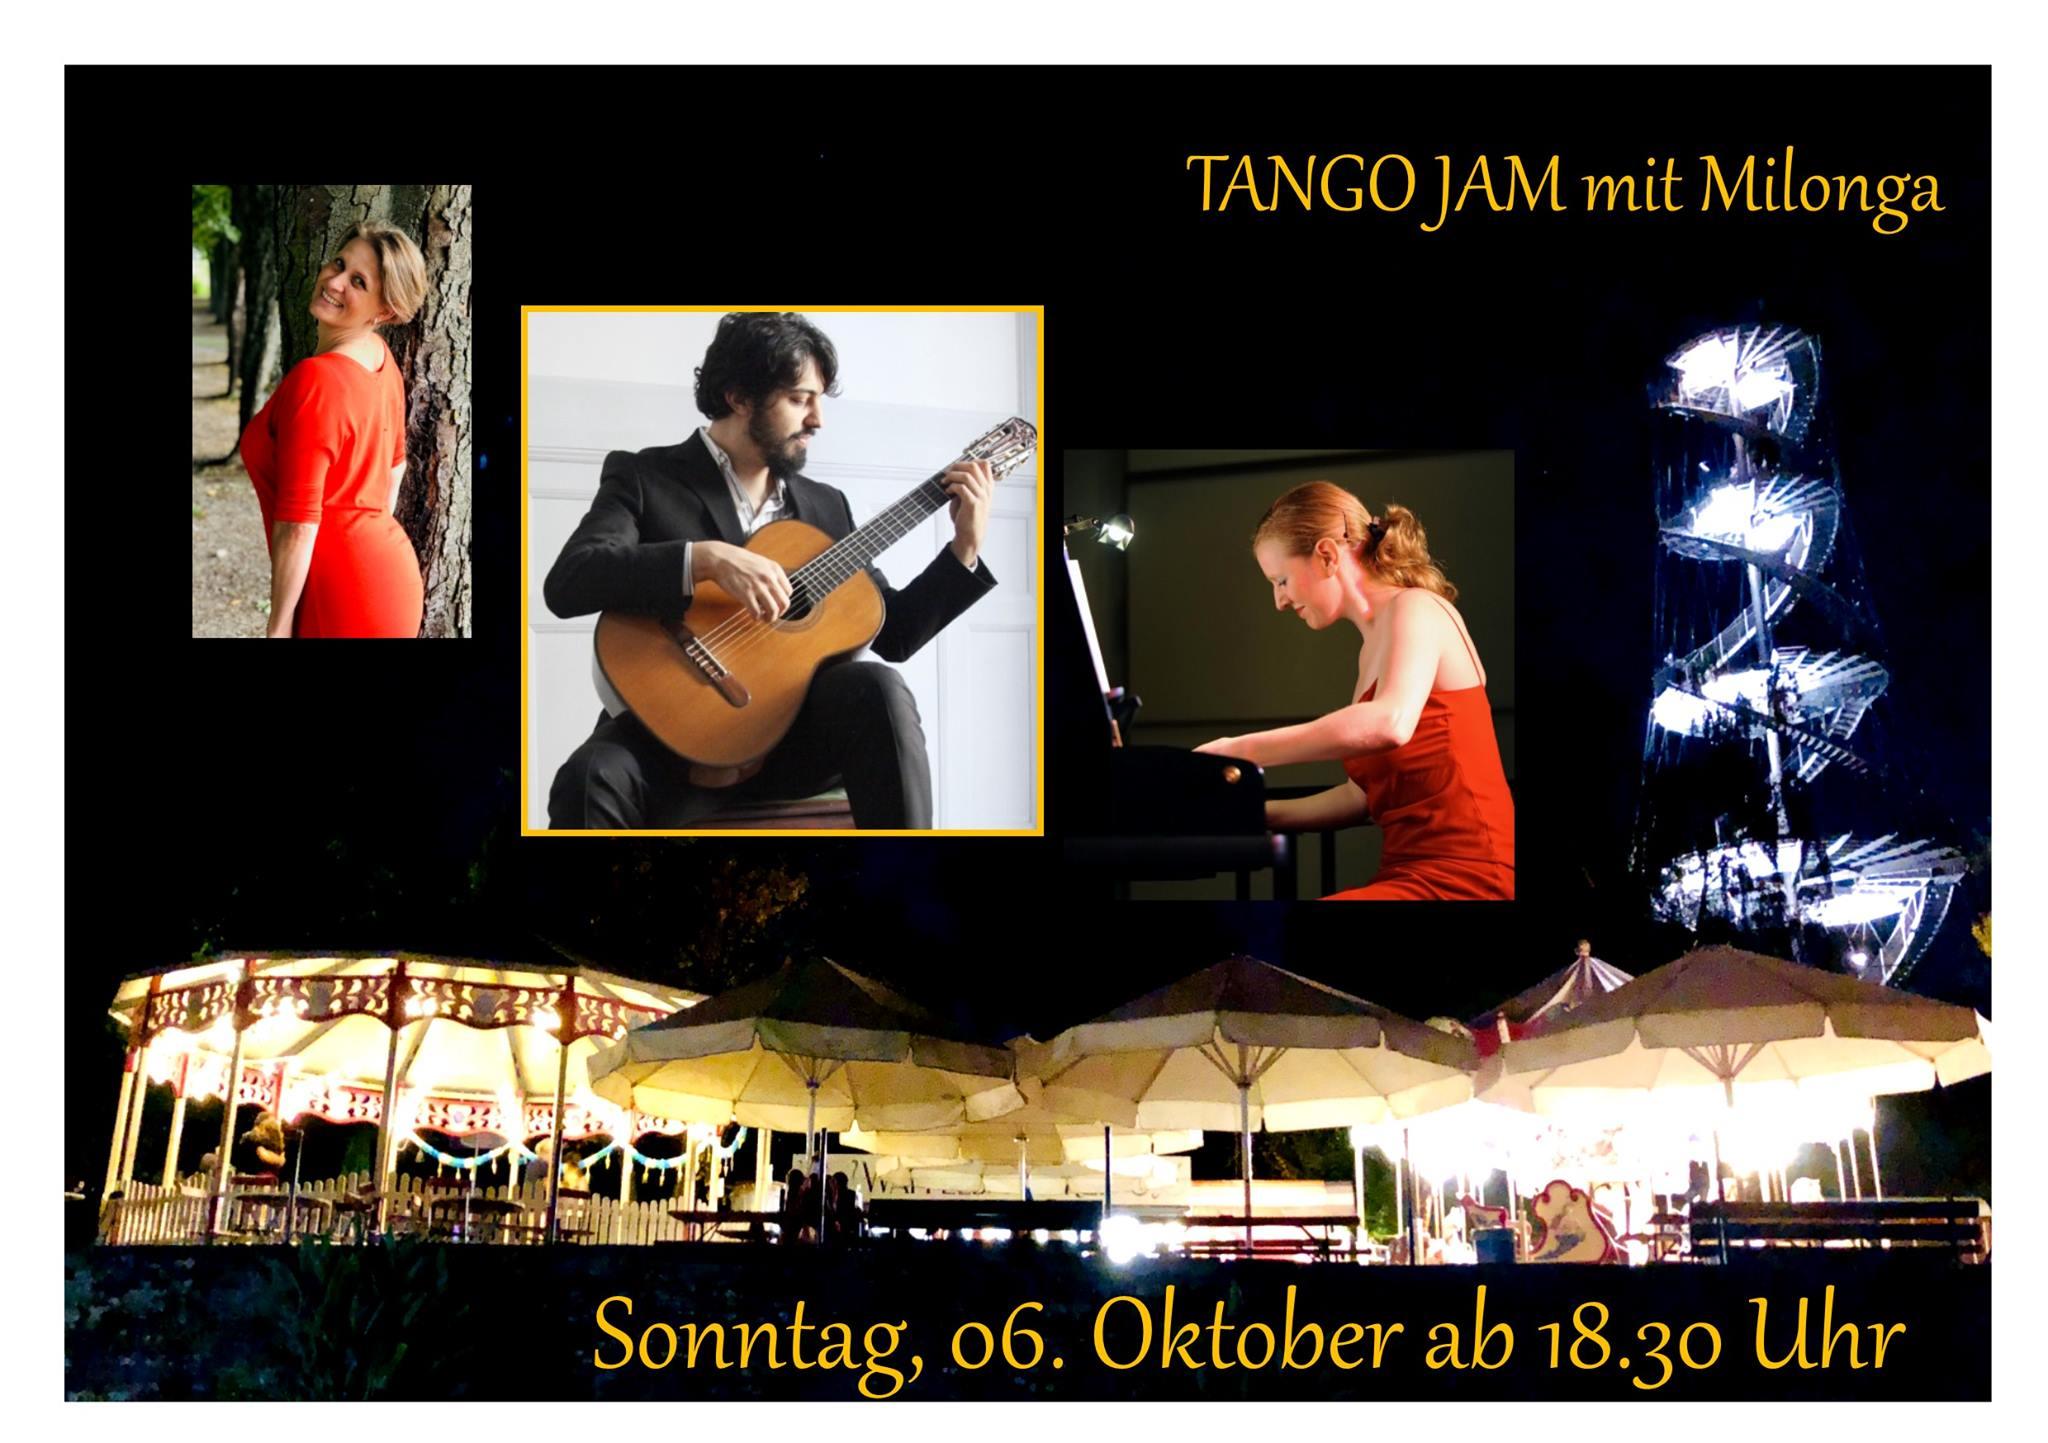 Amores Tango - Musik, Tango, Milonga, Stuttgart, Killesberg